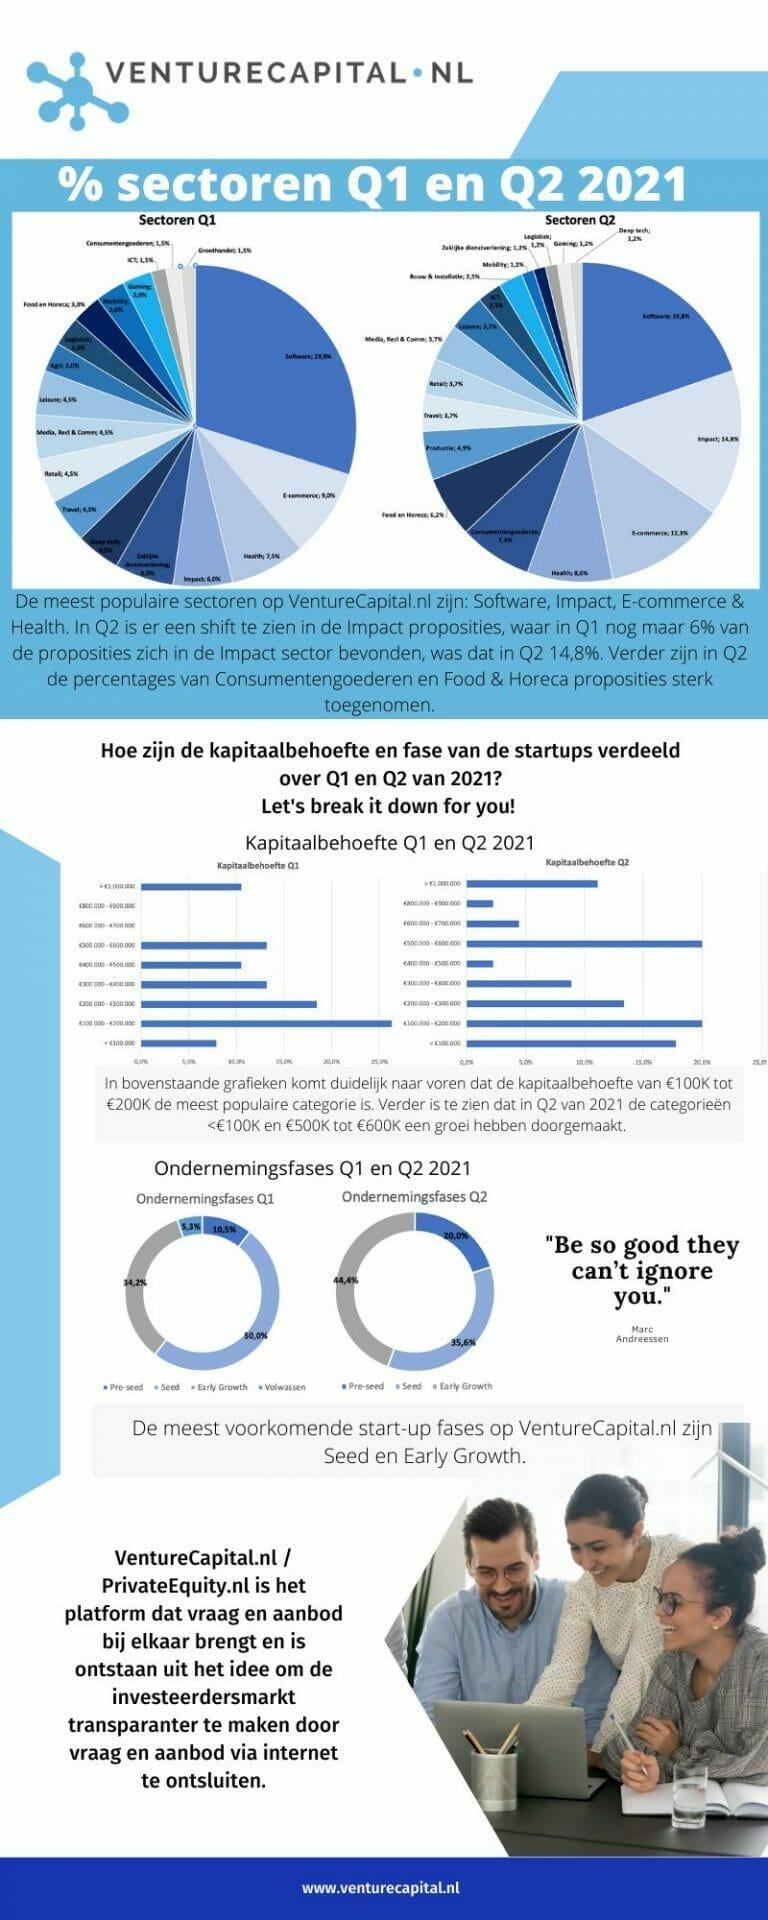 VentureCapital.nl